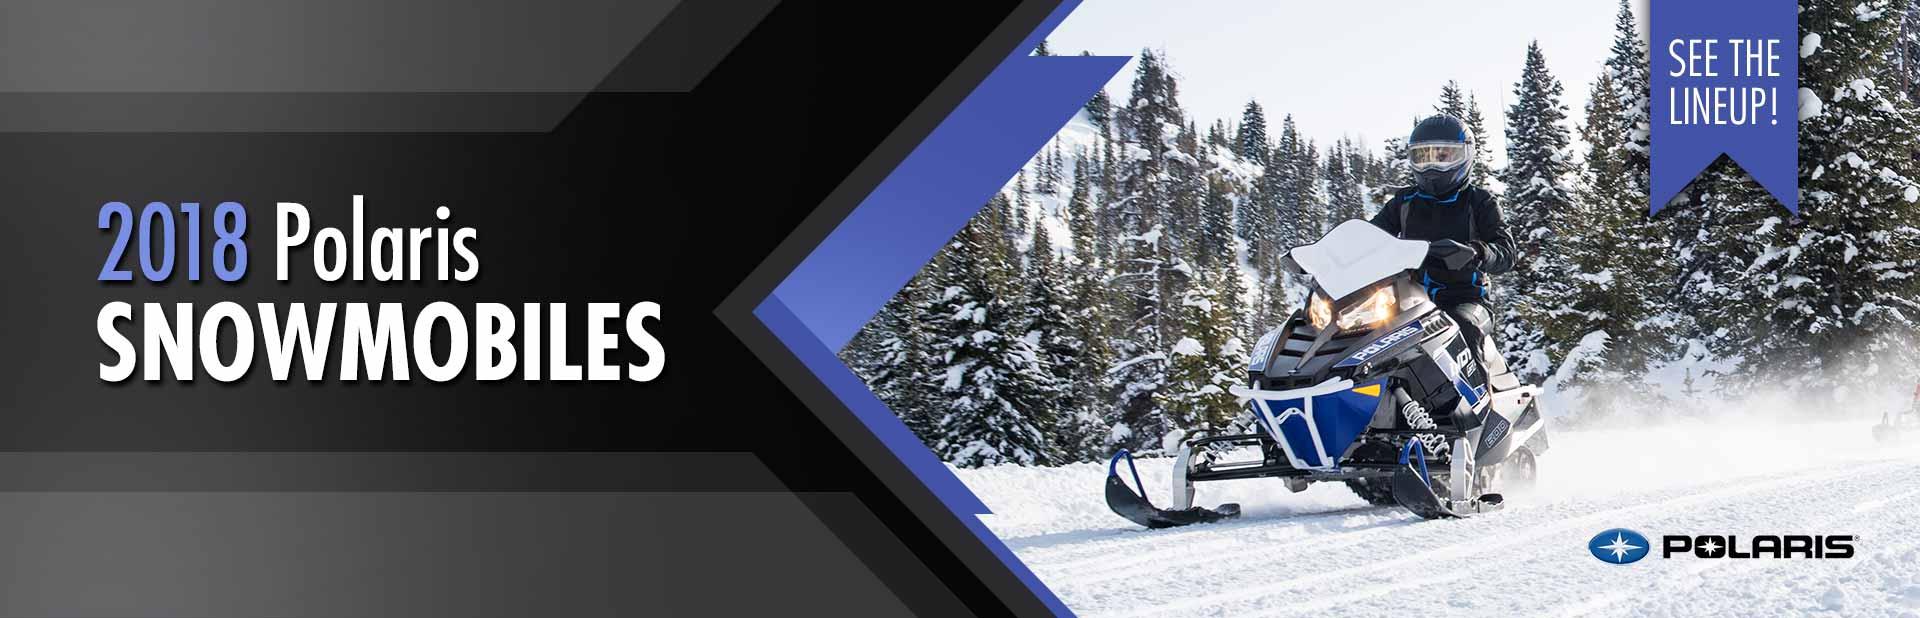 Polaris Dealers Alberta >> Home Whitecap Recreation Slave Lake Ab 780 849 9700